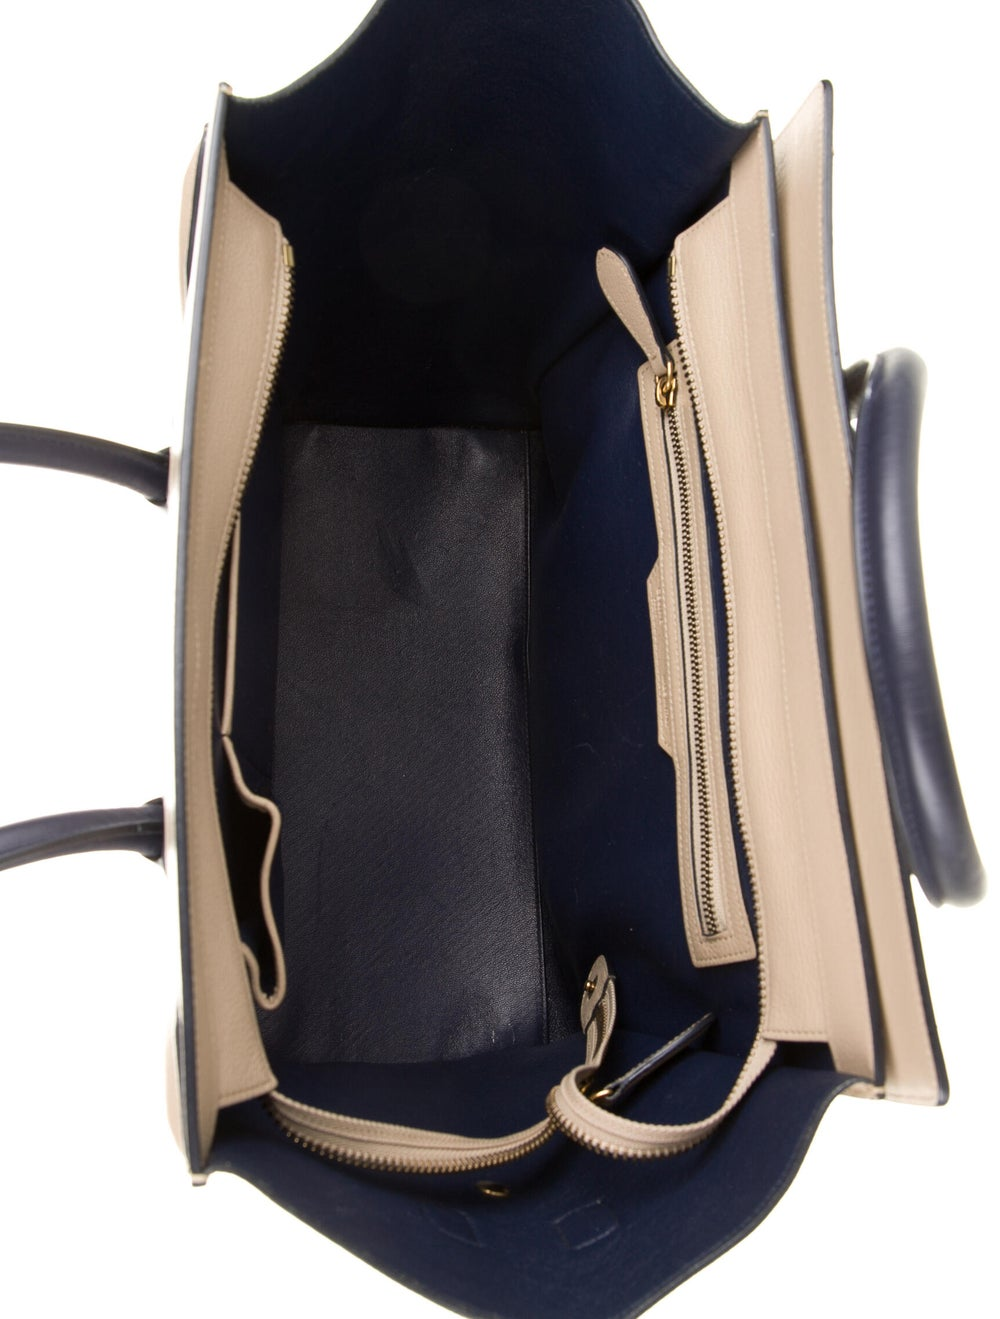 Celine Mini Luggage Tote Tan - image 5